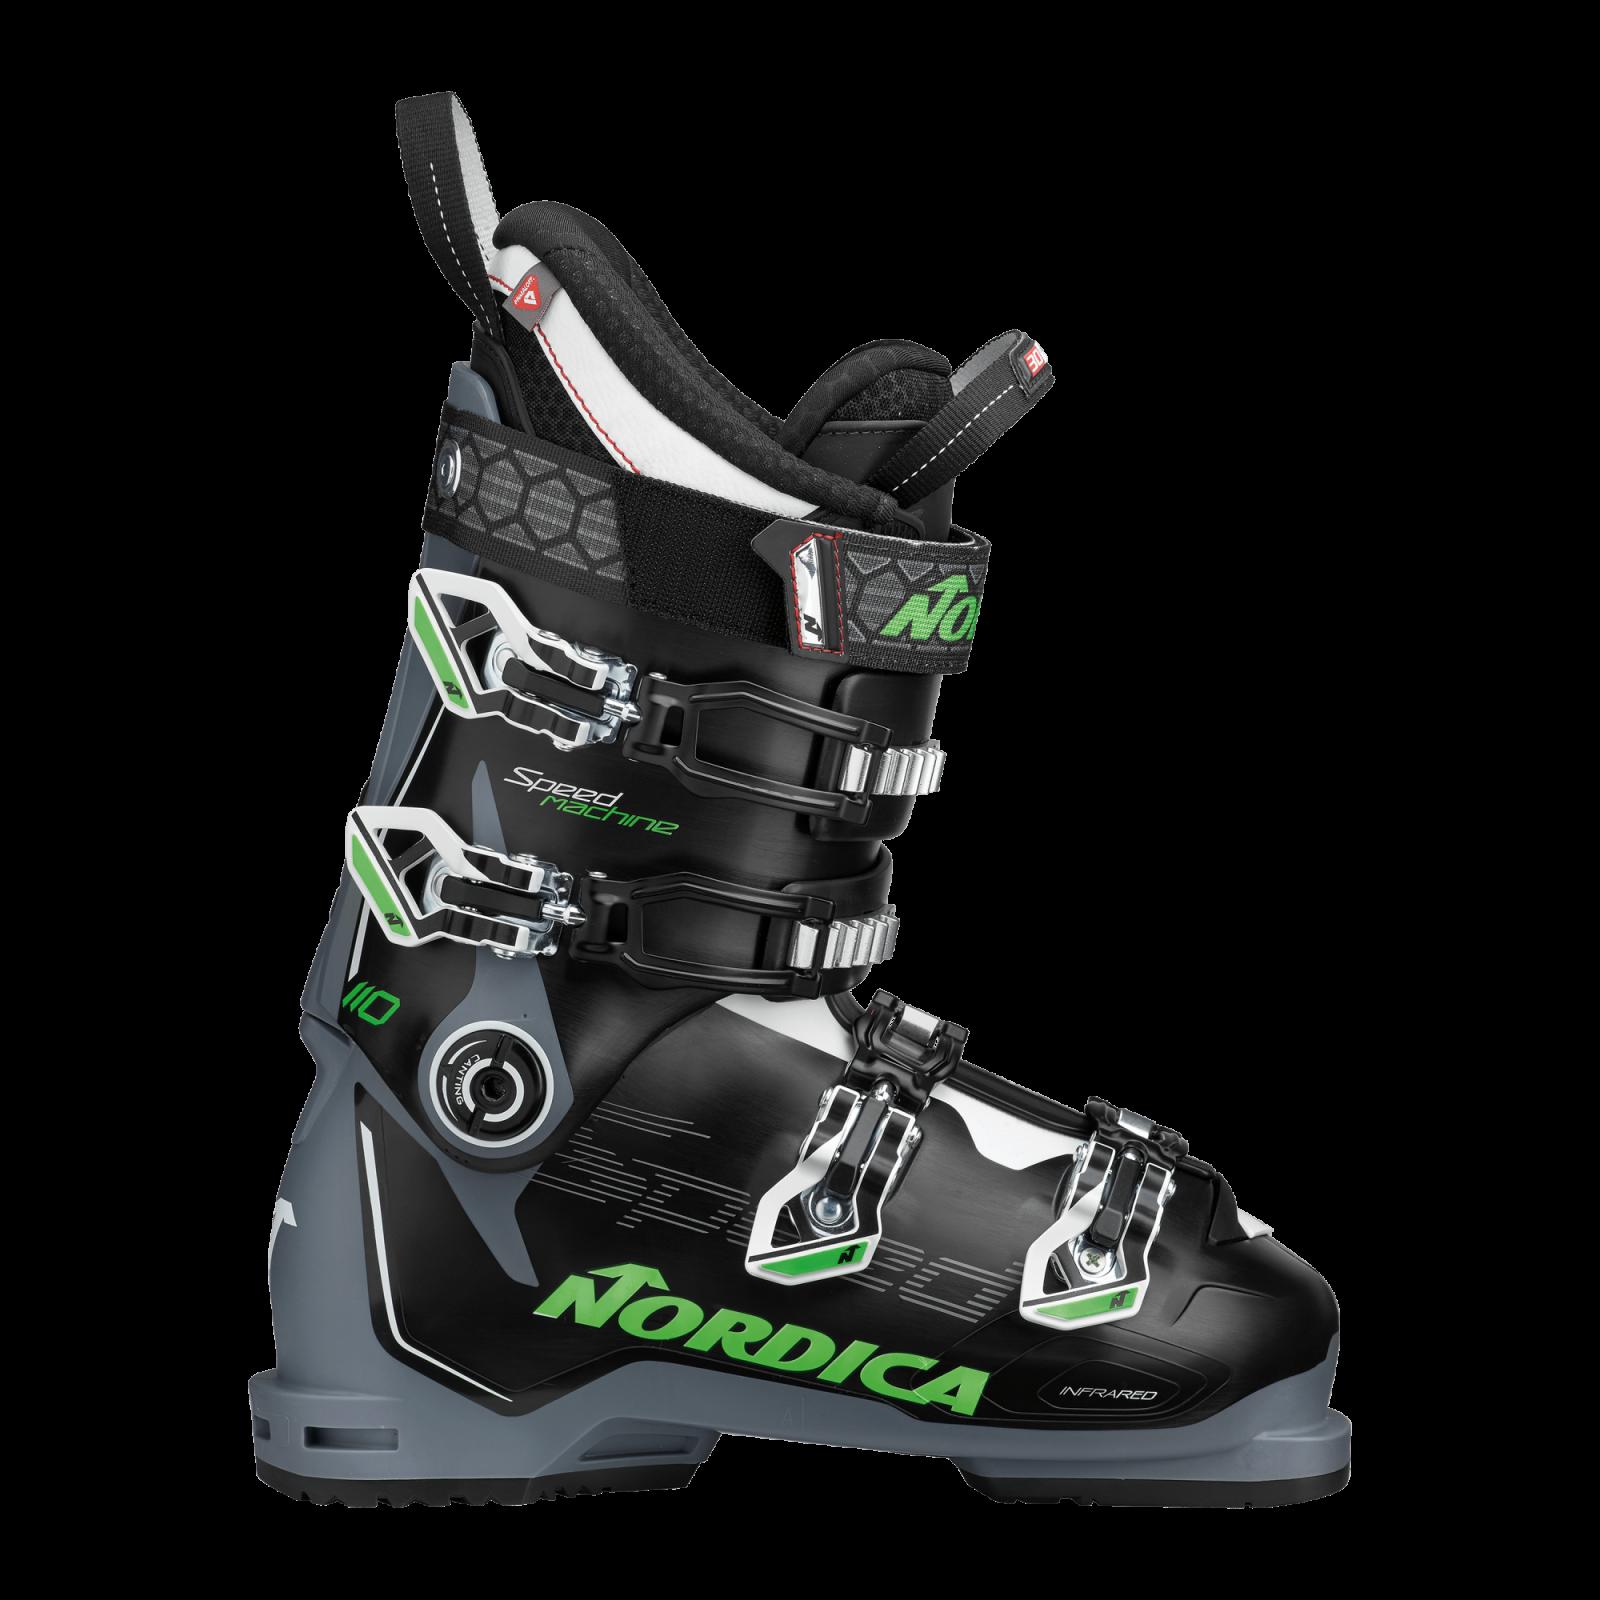 2021 Nordica Speedmachine 110 Men's Ski Boots